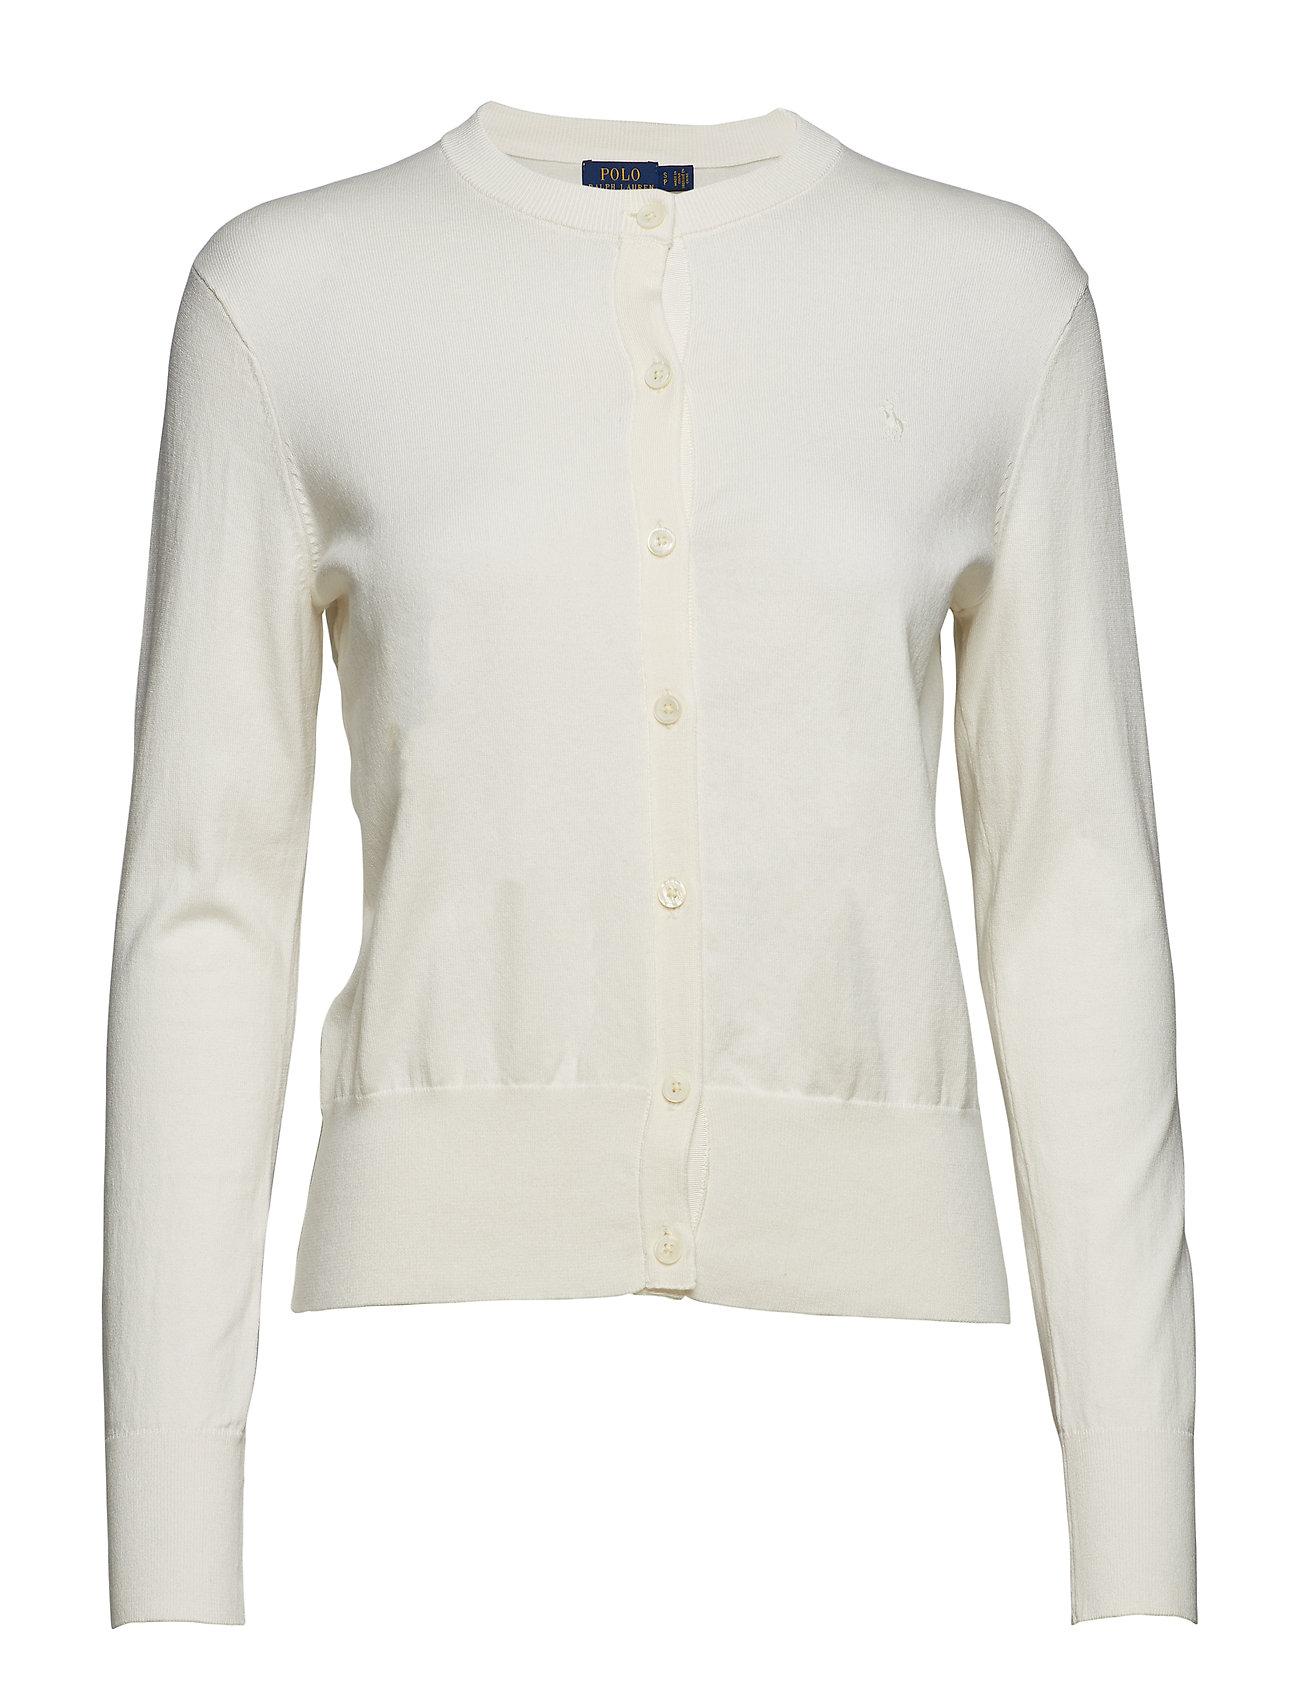 c3212f049d32 Cotton Cardigan Sweater (Collection Cream) (£125) - Polo Ralph ...